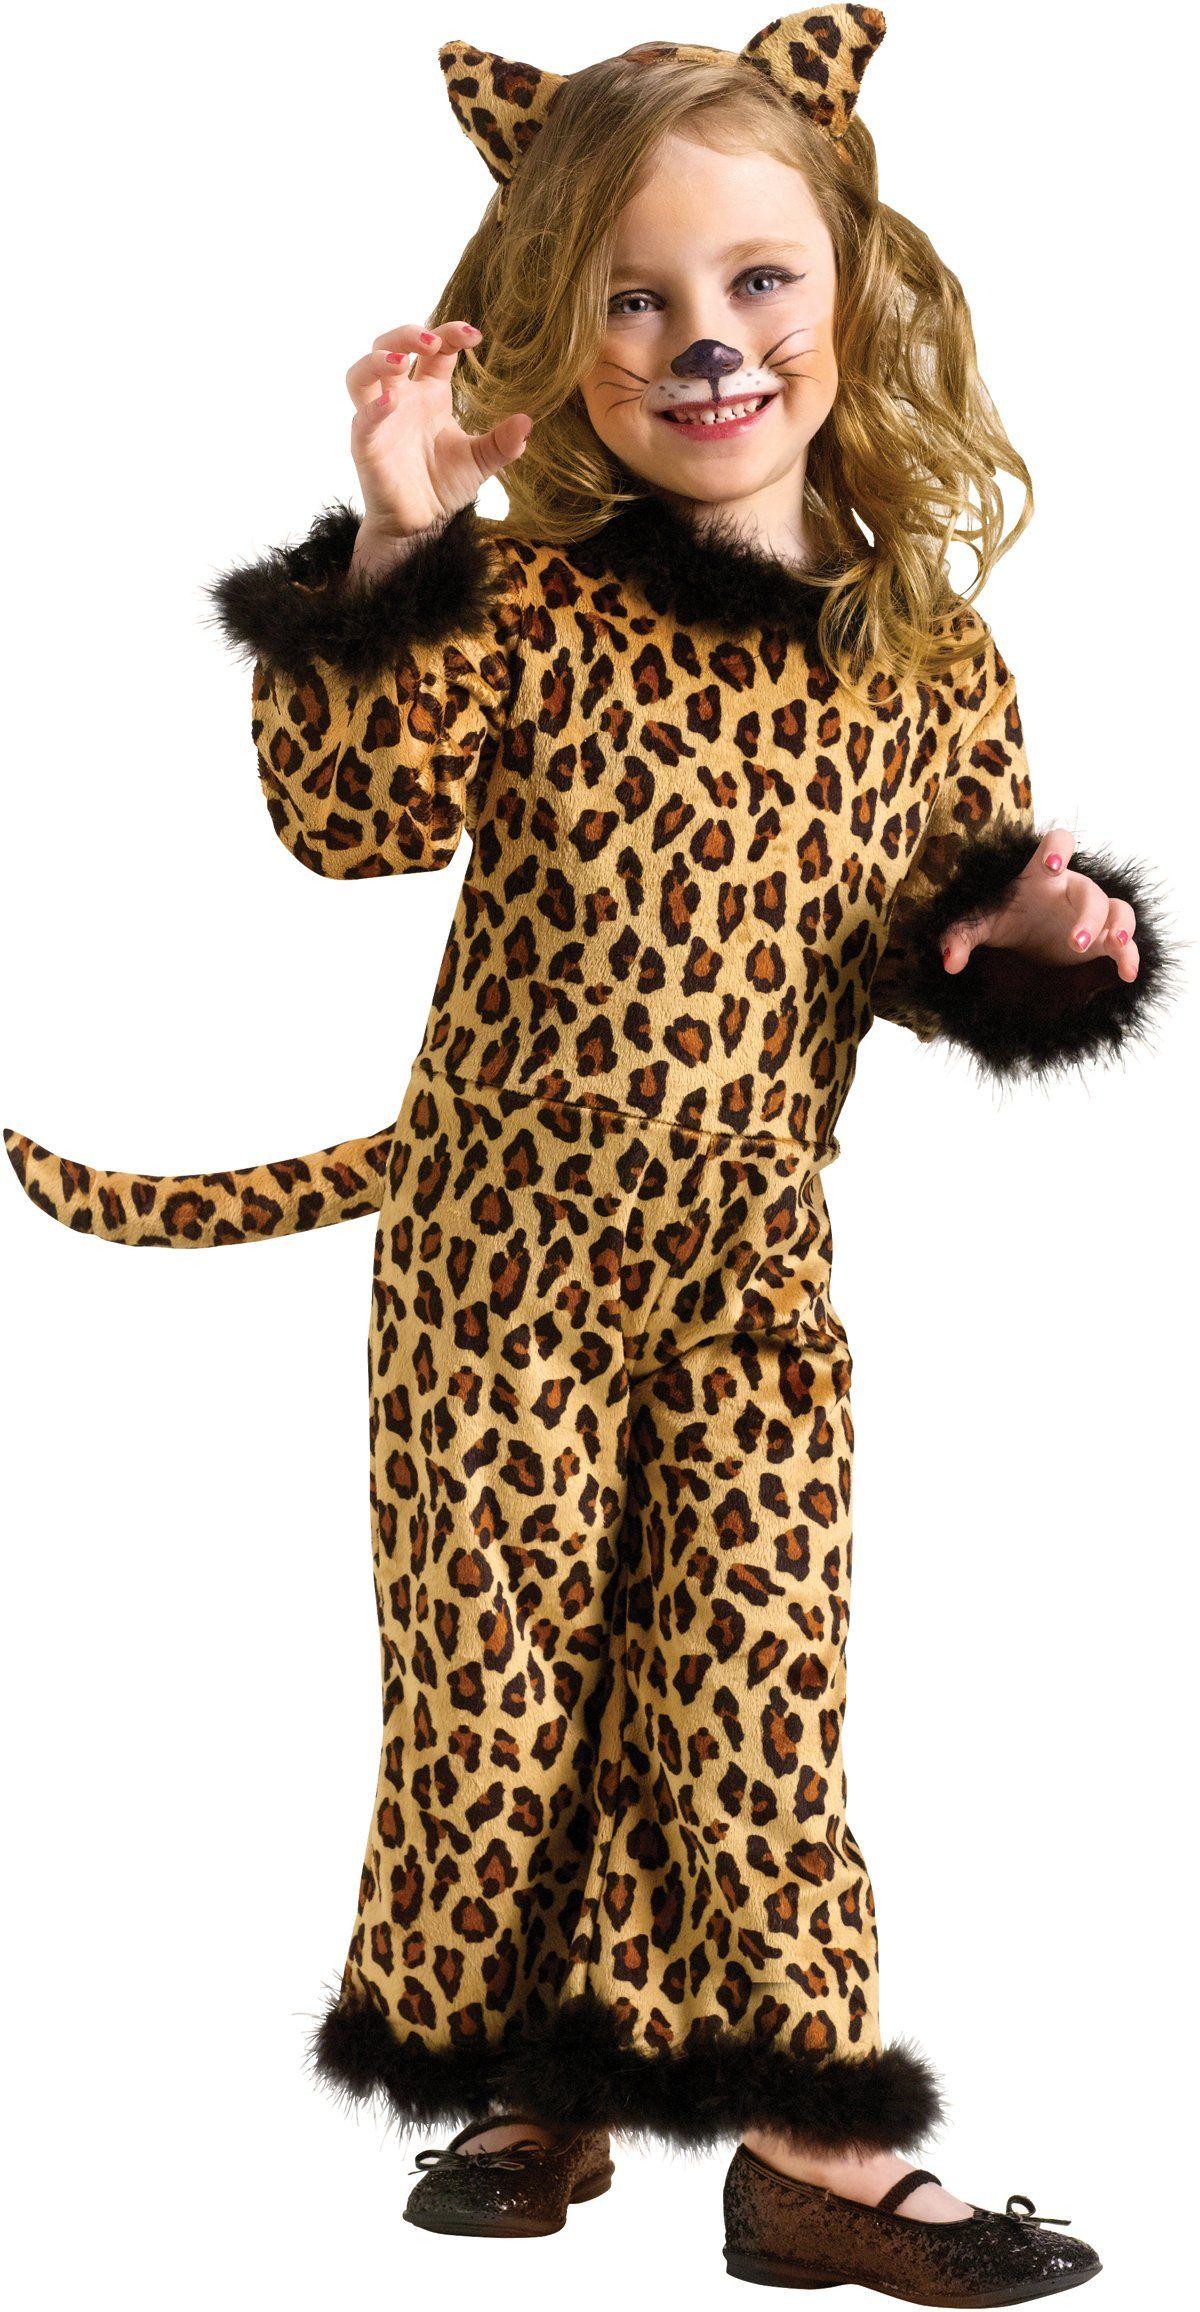 2aa71c587098 Precious Leopard Toddler Costume in 2019 | 2018 costumes | Leopard ...